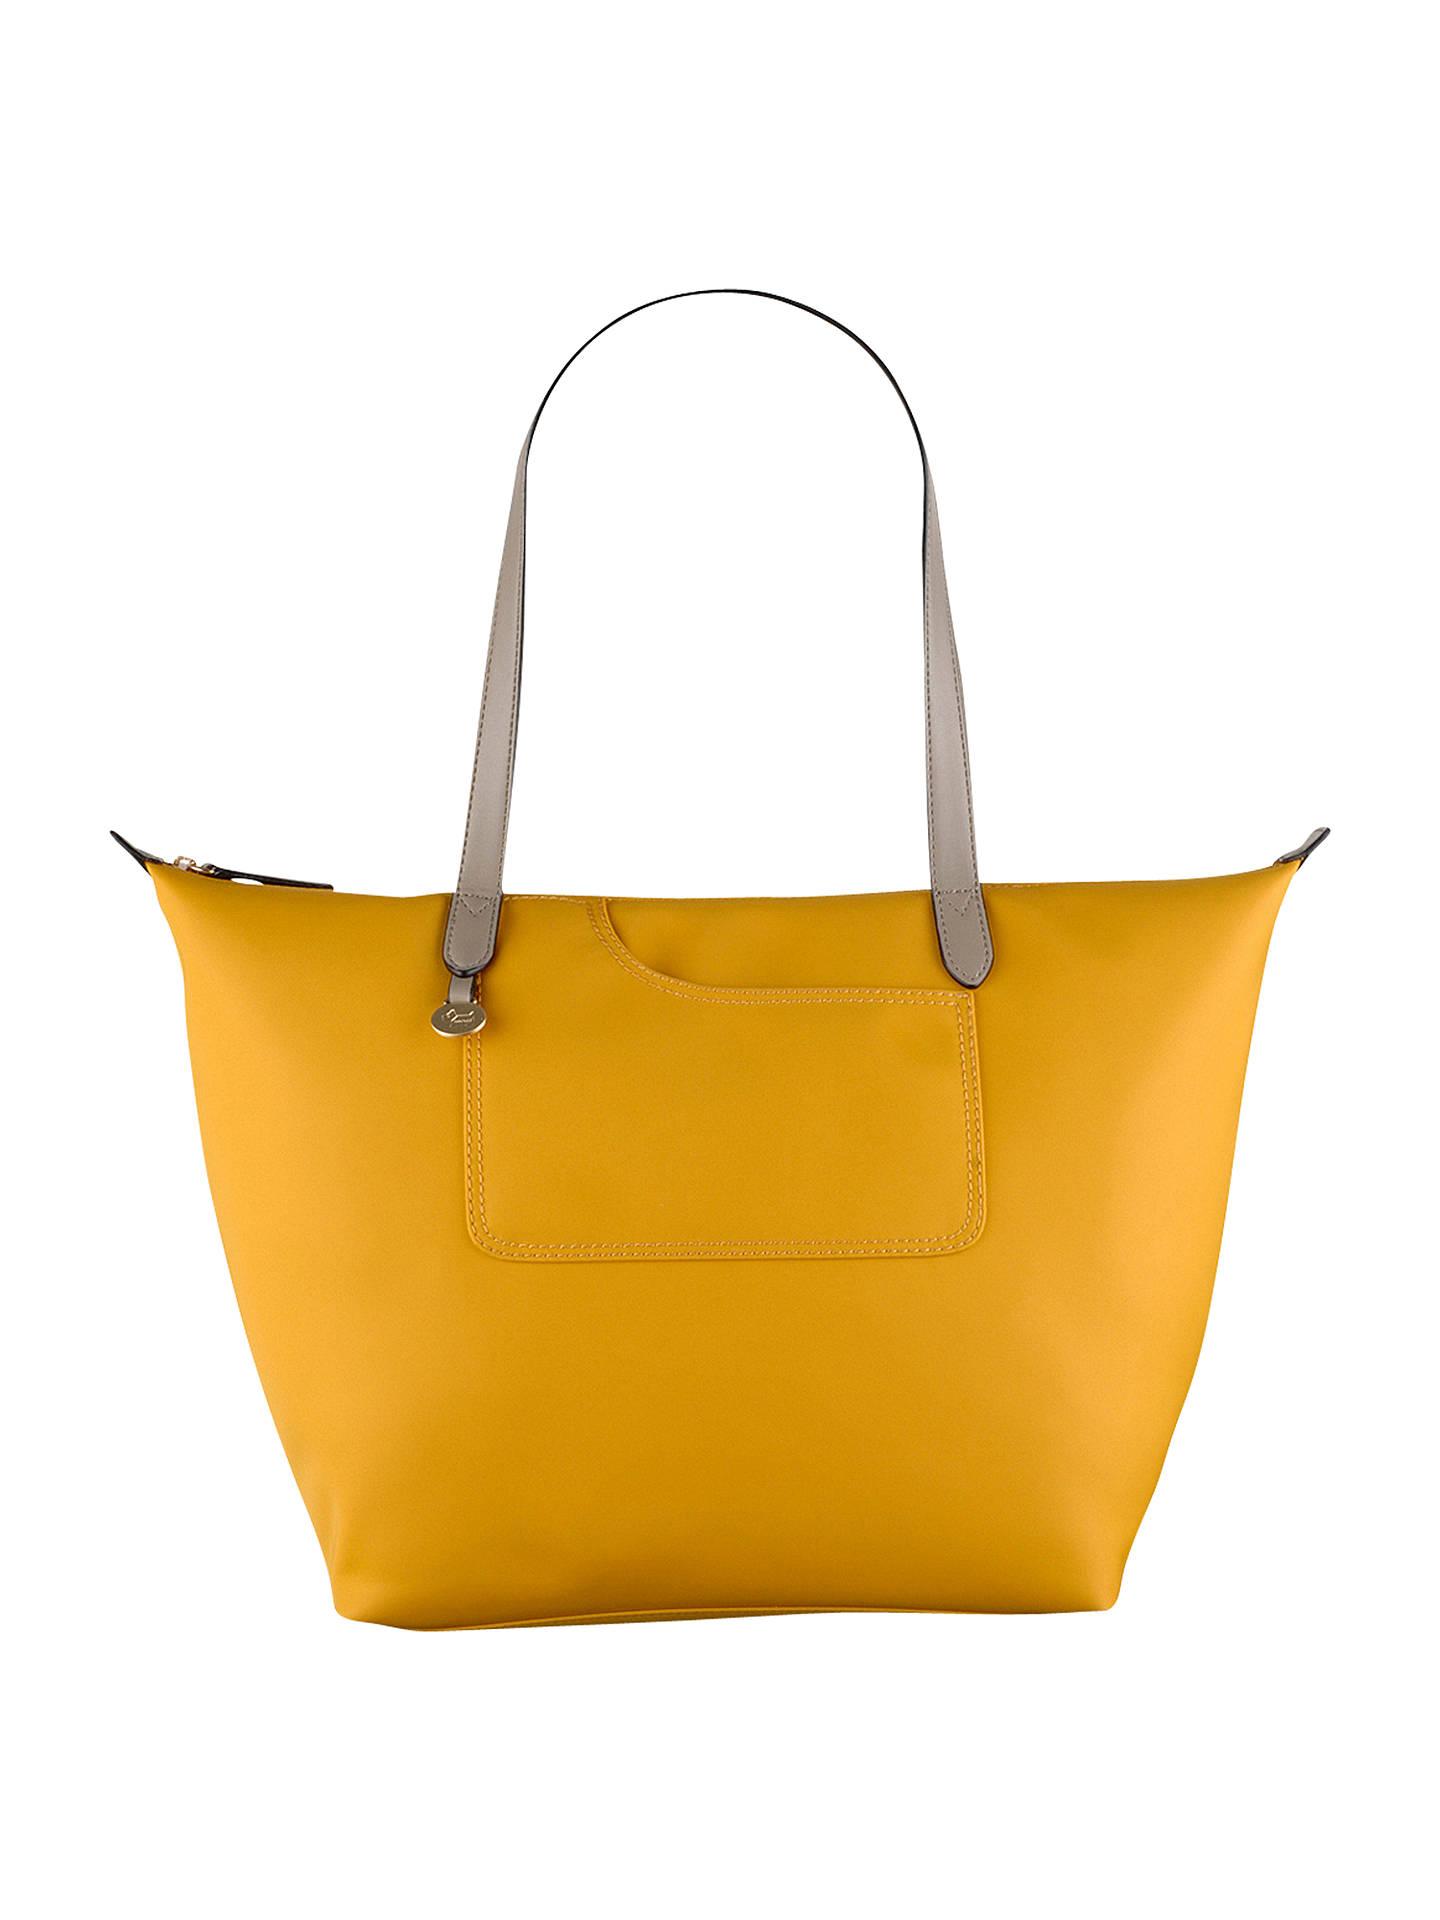 Radley Pocket Essentials Large Zip Top Tote Bag At John Lewis Partners